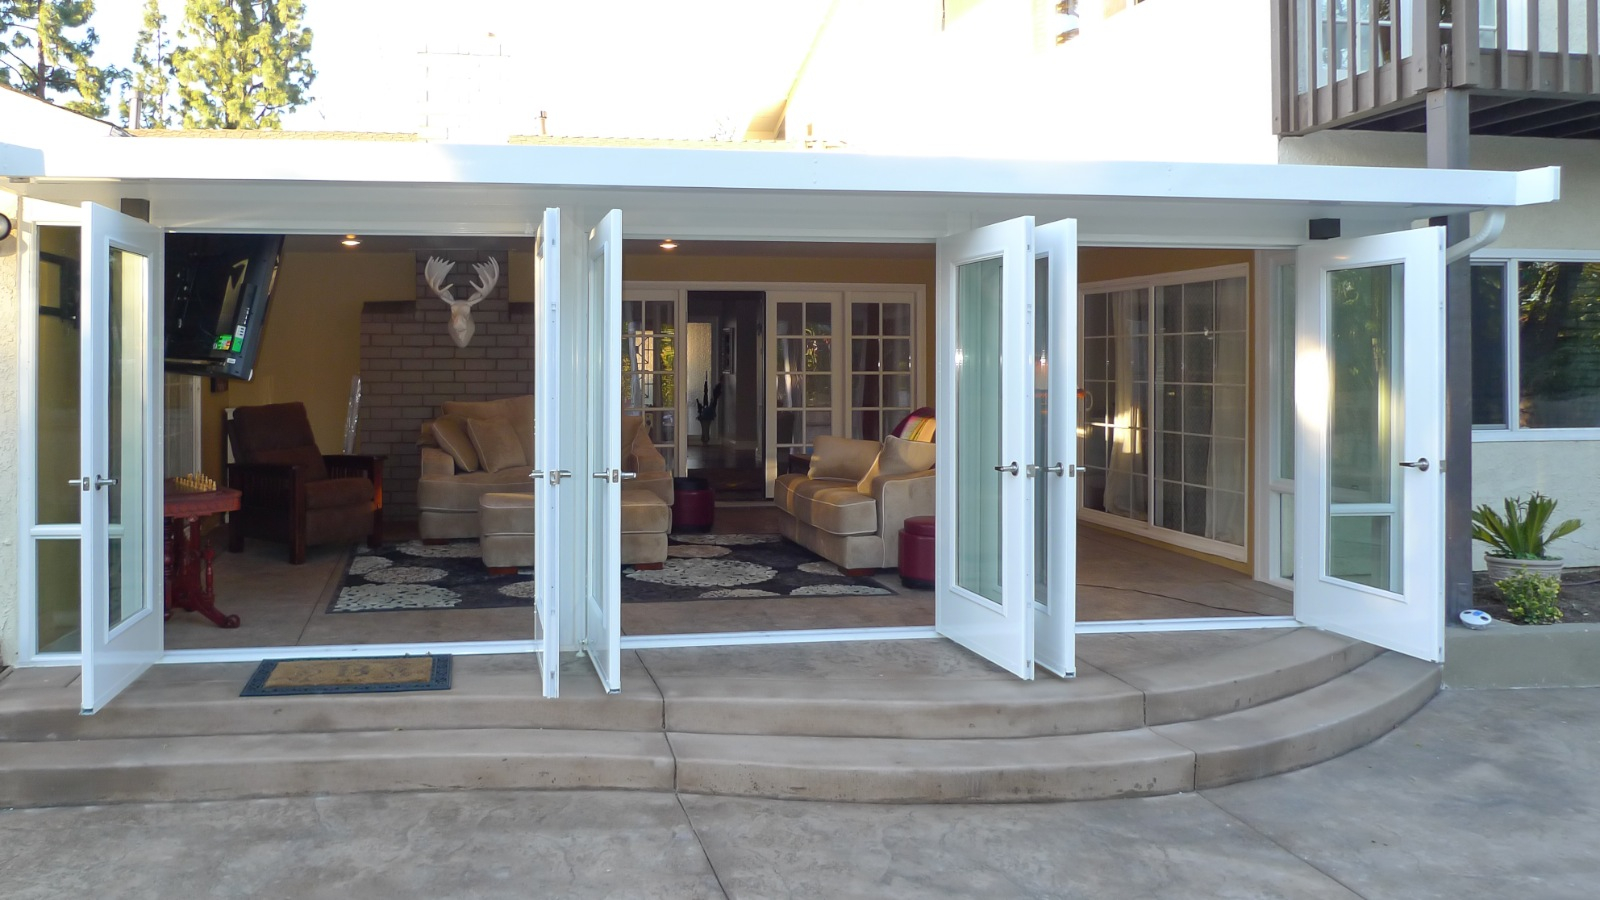 Etonnant Delightful Enclosed Patio Designs 4 M 0db3c38dfc49 Anadolukardiyolderg  Regarding Proportions 1600 X 900